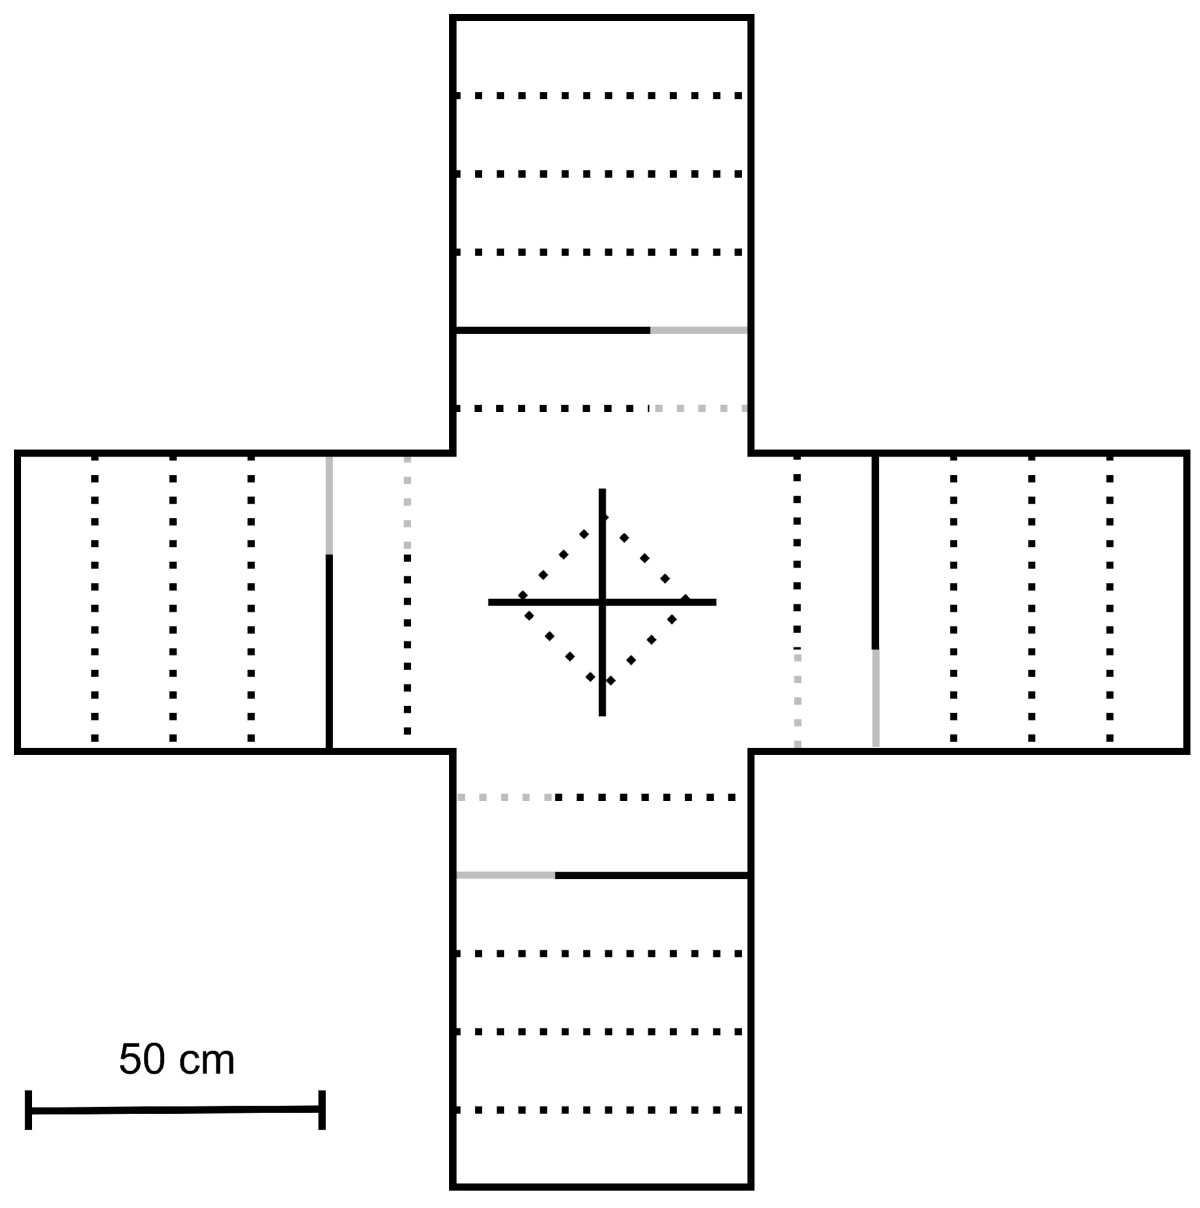 https://static-content.springer.com/image/art%3A10.1186%2F1471-2148-11-44/MediaObjects/12862_2010_1642_Fig3_HTML.jpg